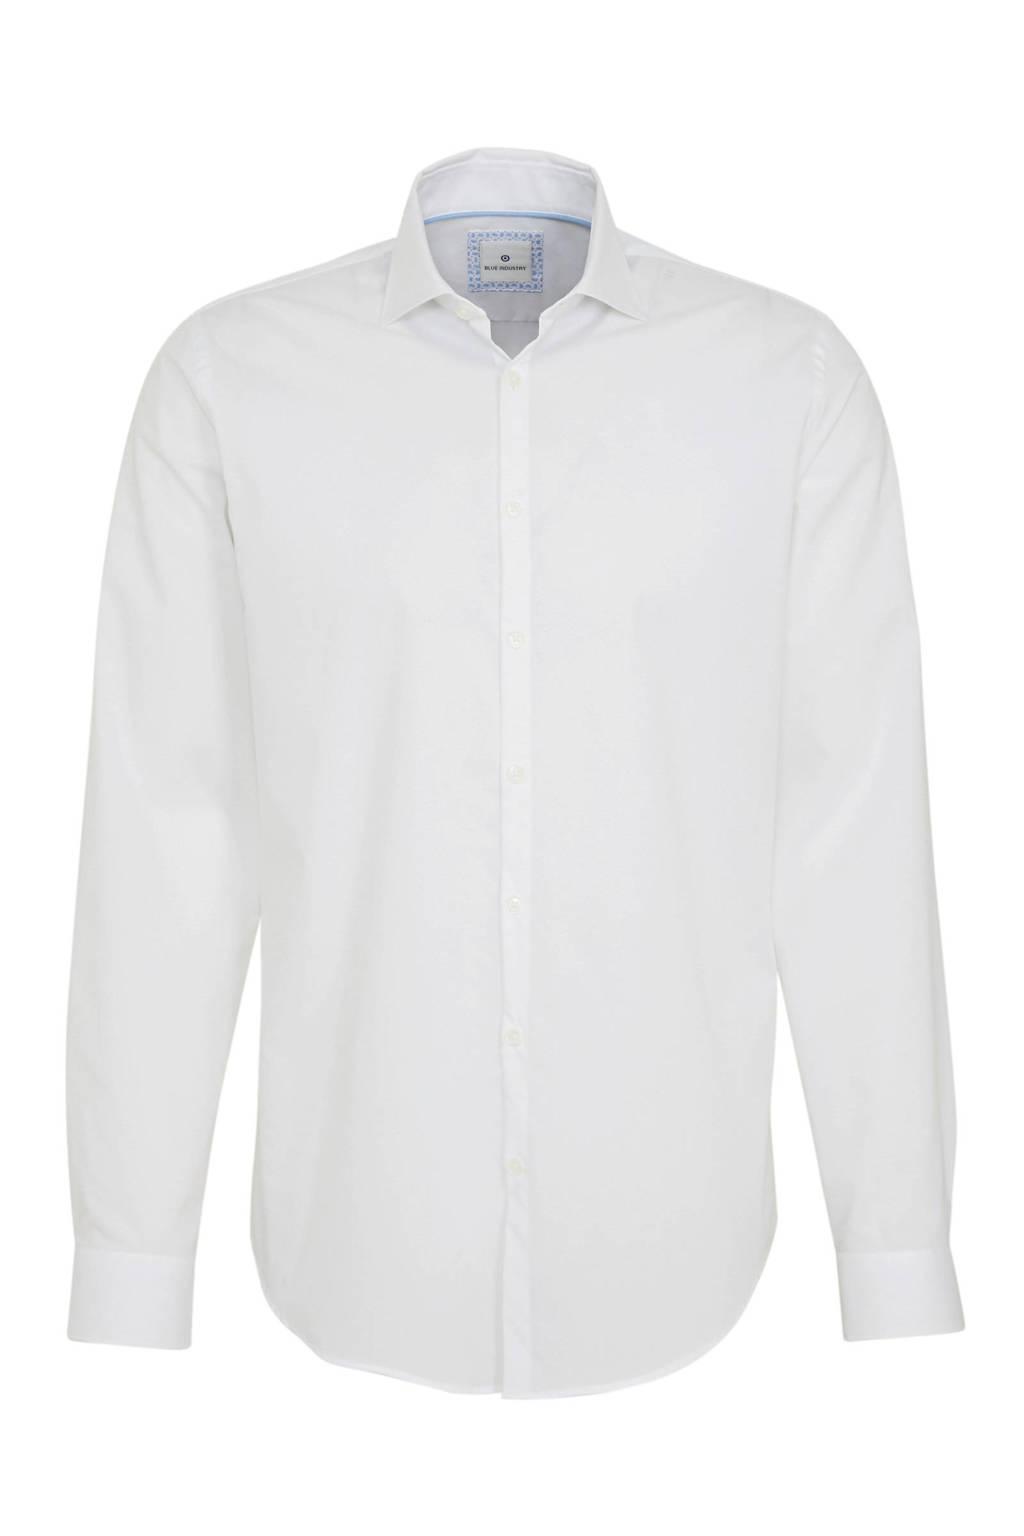 Blue Industry slim fit overhemd wit, Wit